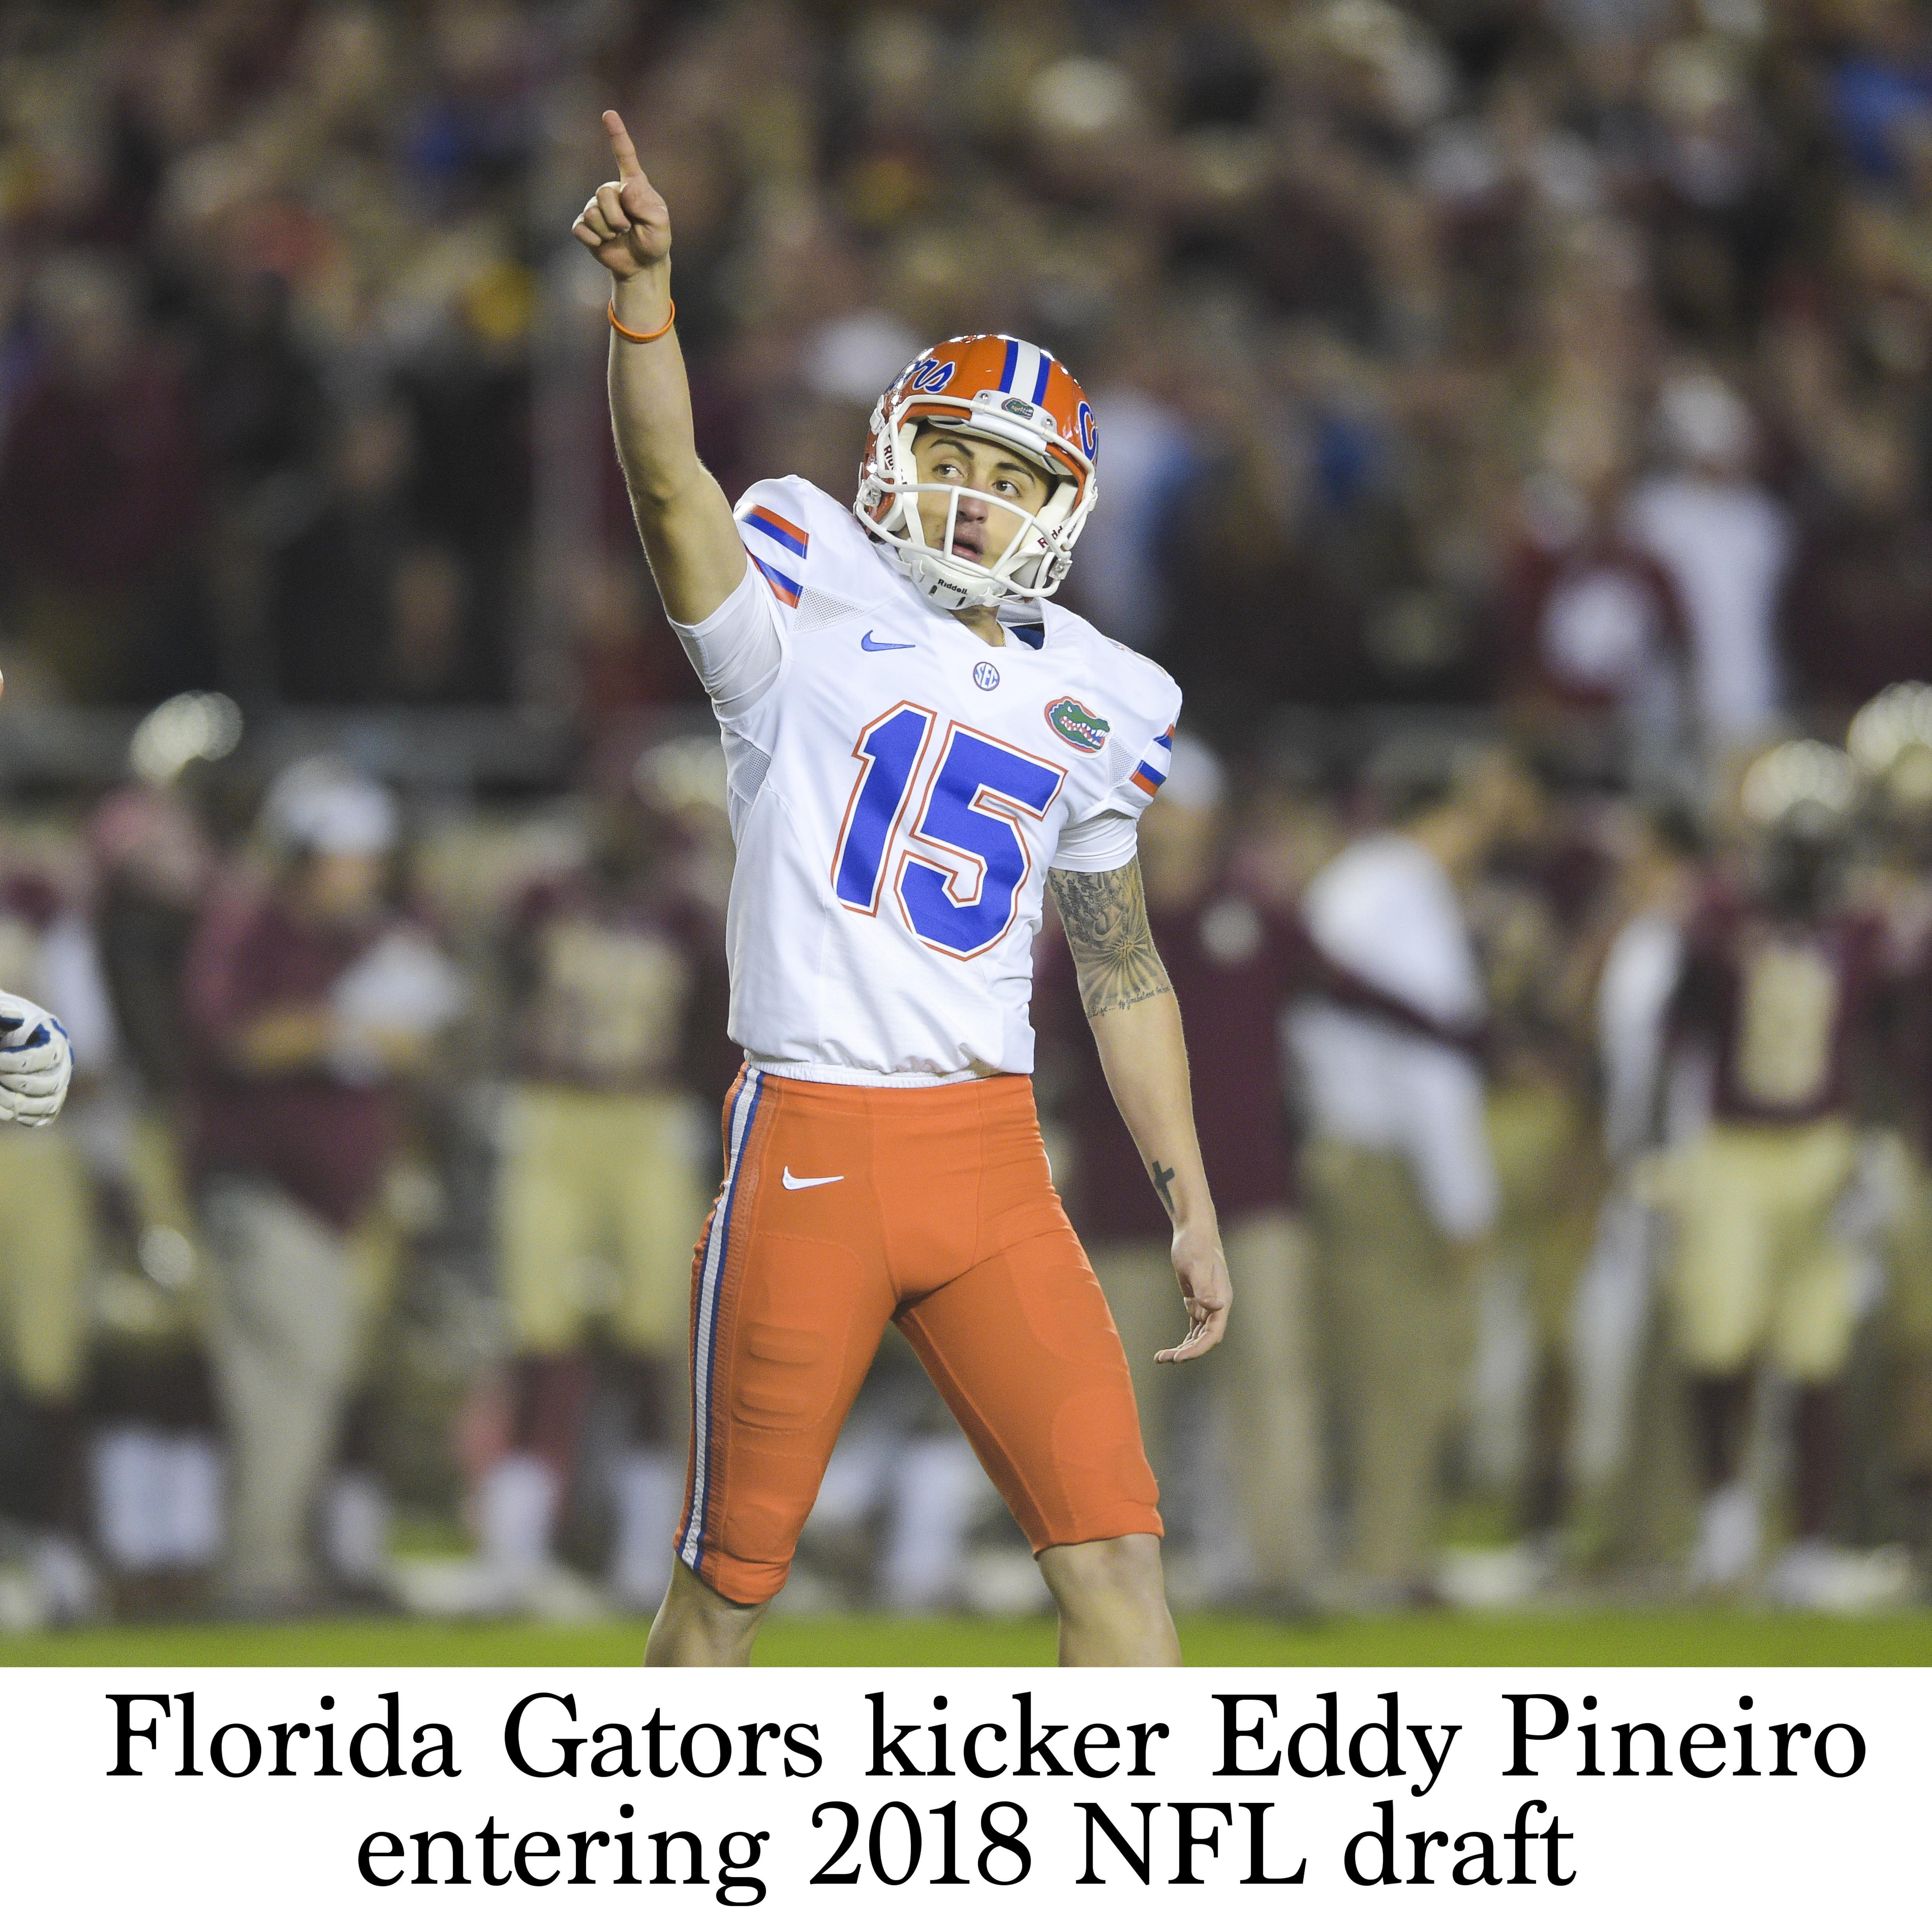 timeless design fc14a a7e1b Florida Gators kicker Eddy Pineiro entering 2018 NFL draft